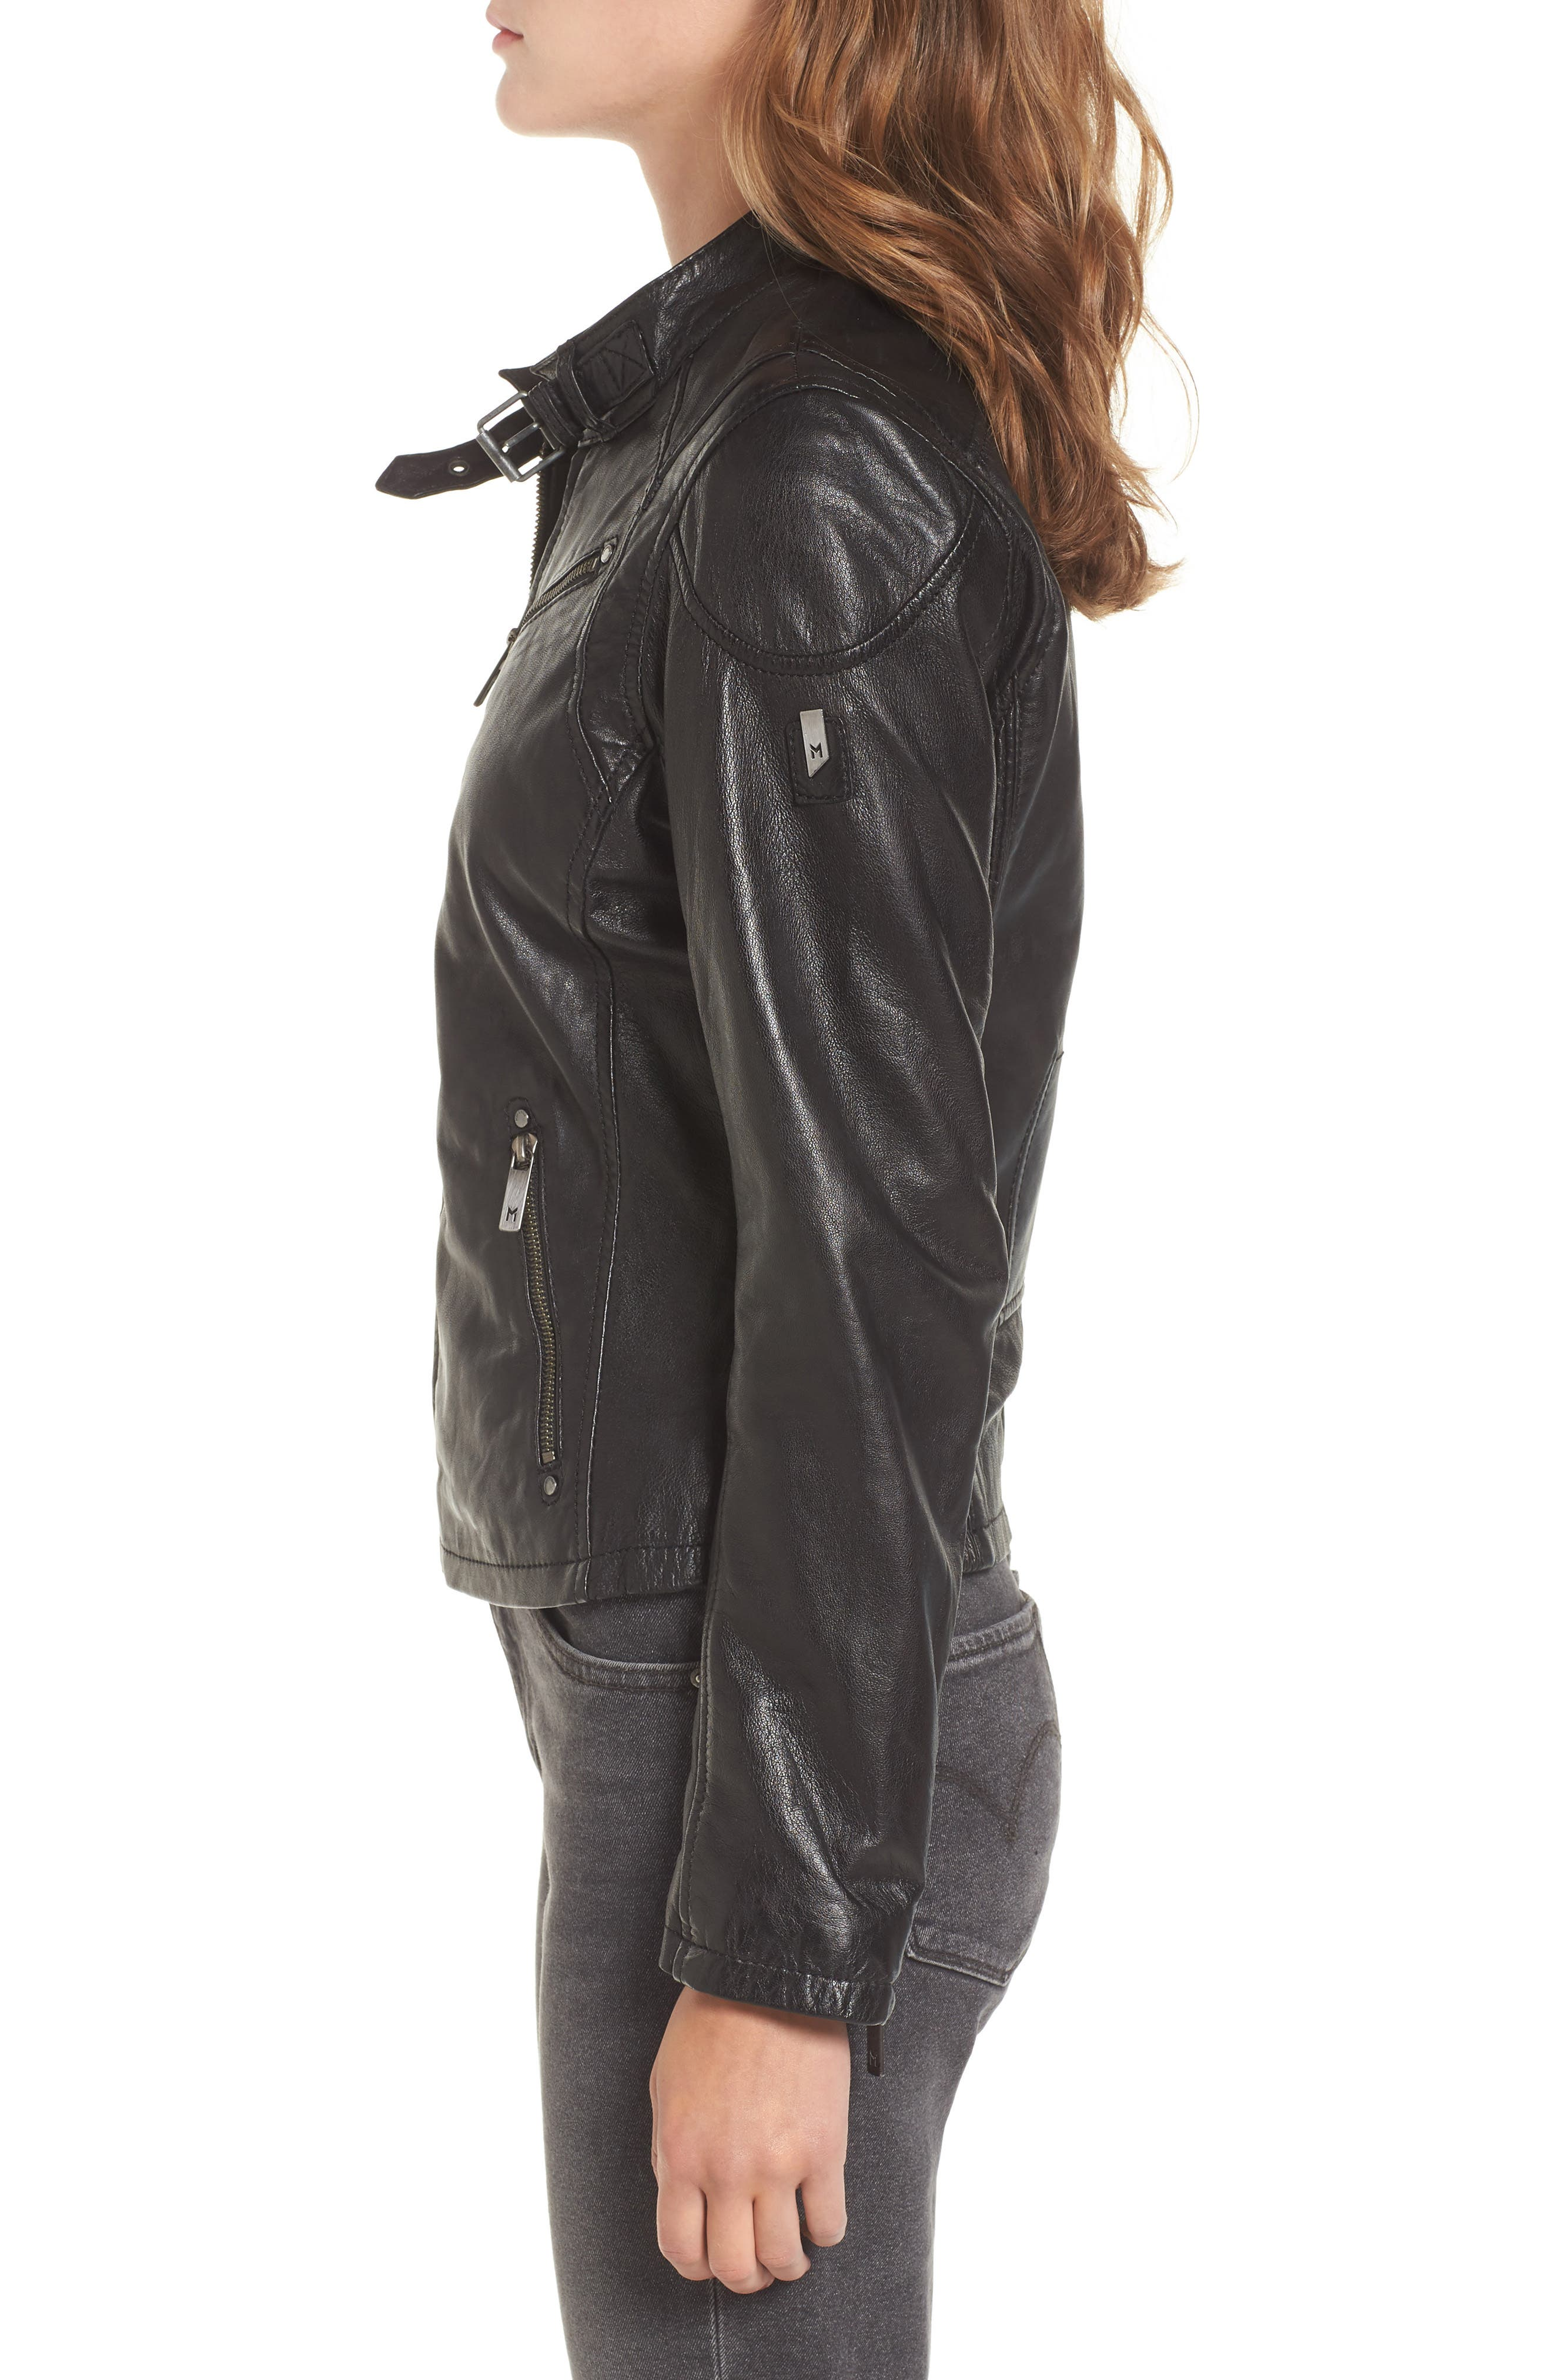 MAURITIUS, Leather Lambskin Leather Moto Jacket, Alternate thumbnail 3, color, 001